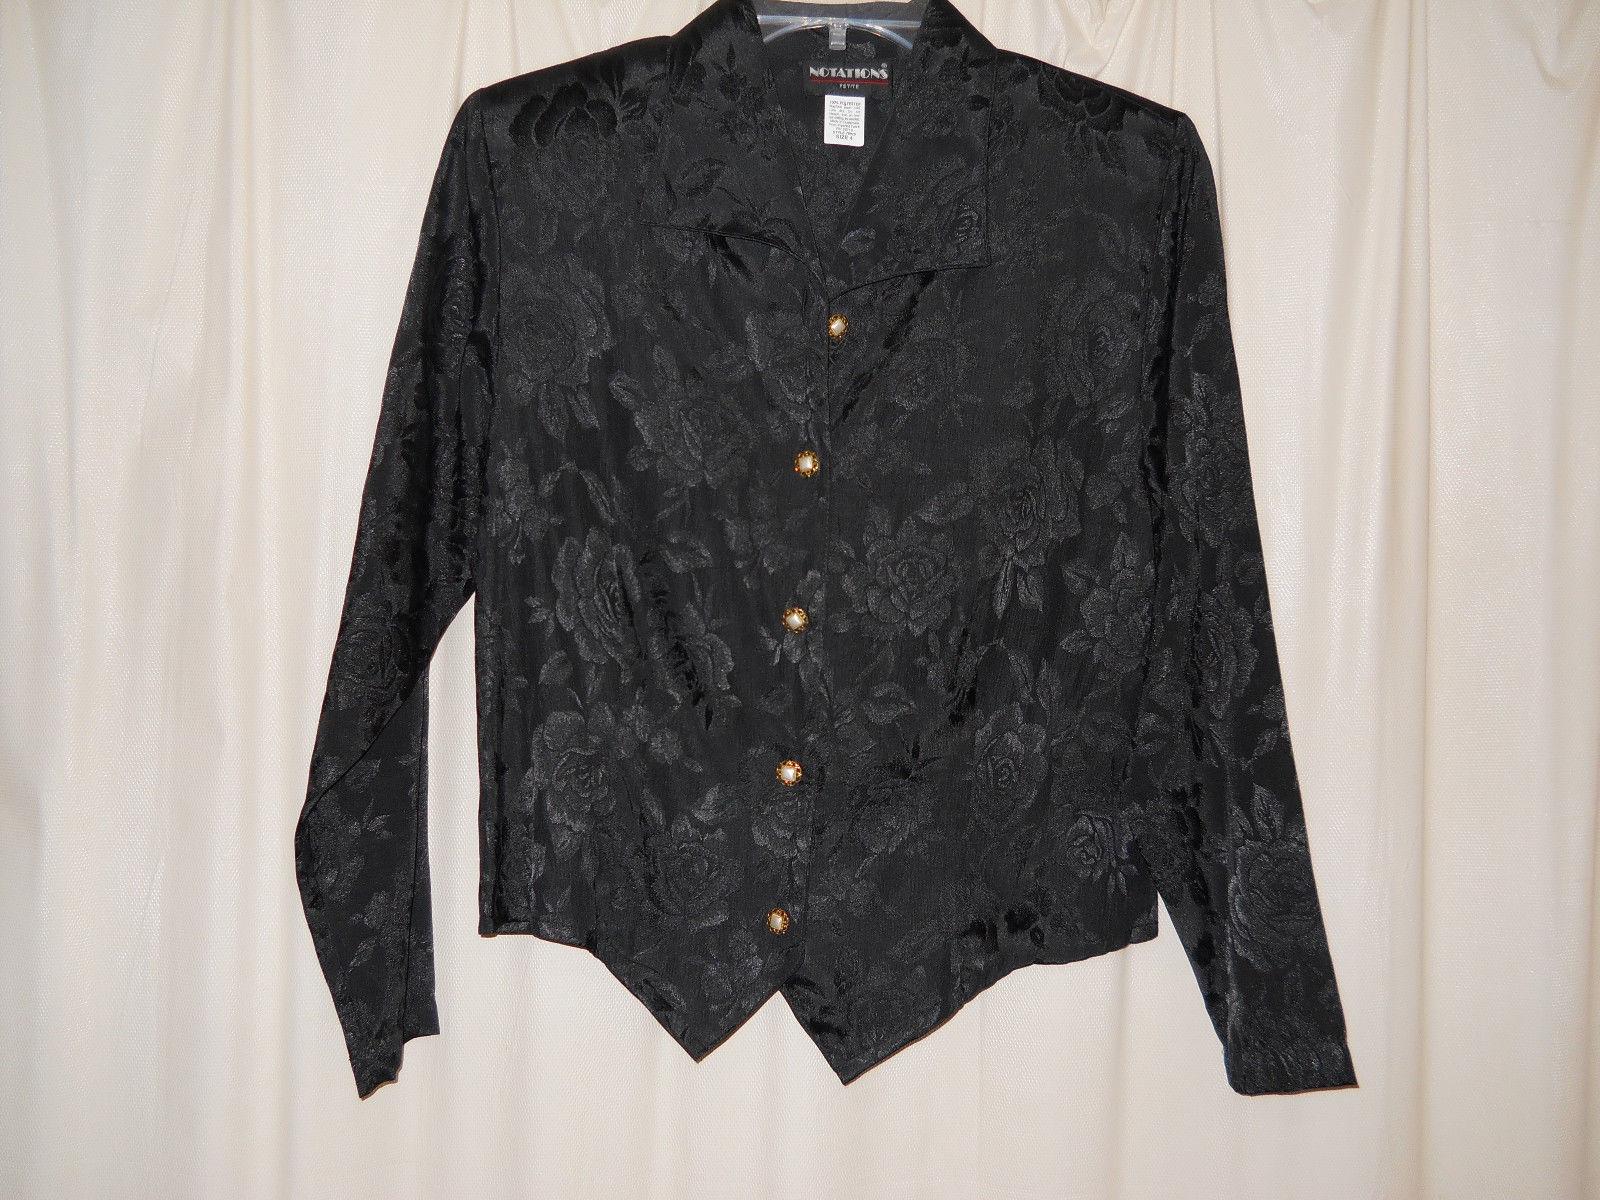 Vintage Notations Black Long Sleeve Blouse Floral Pattern Size Petite 4 - $4.50